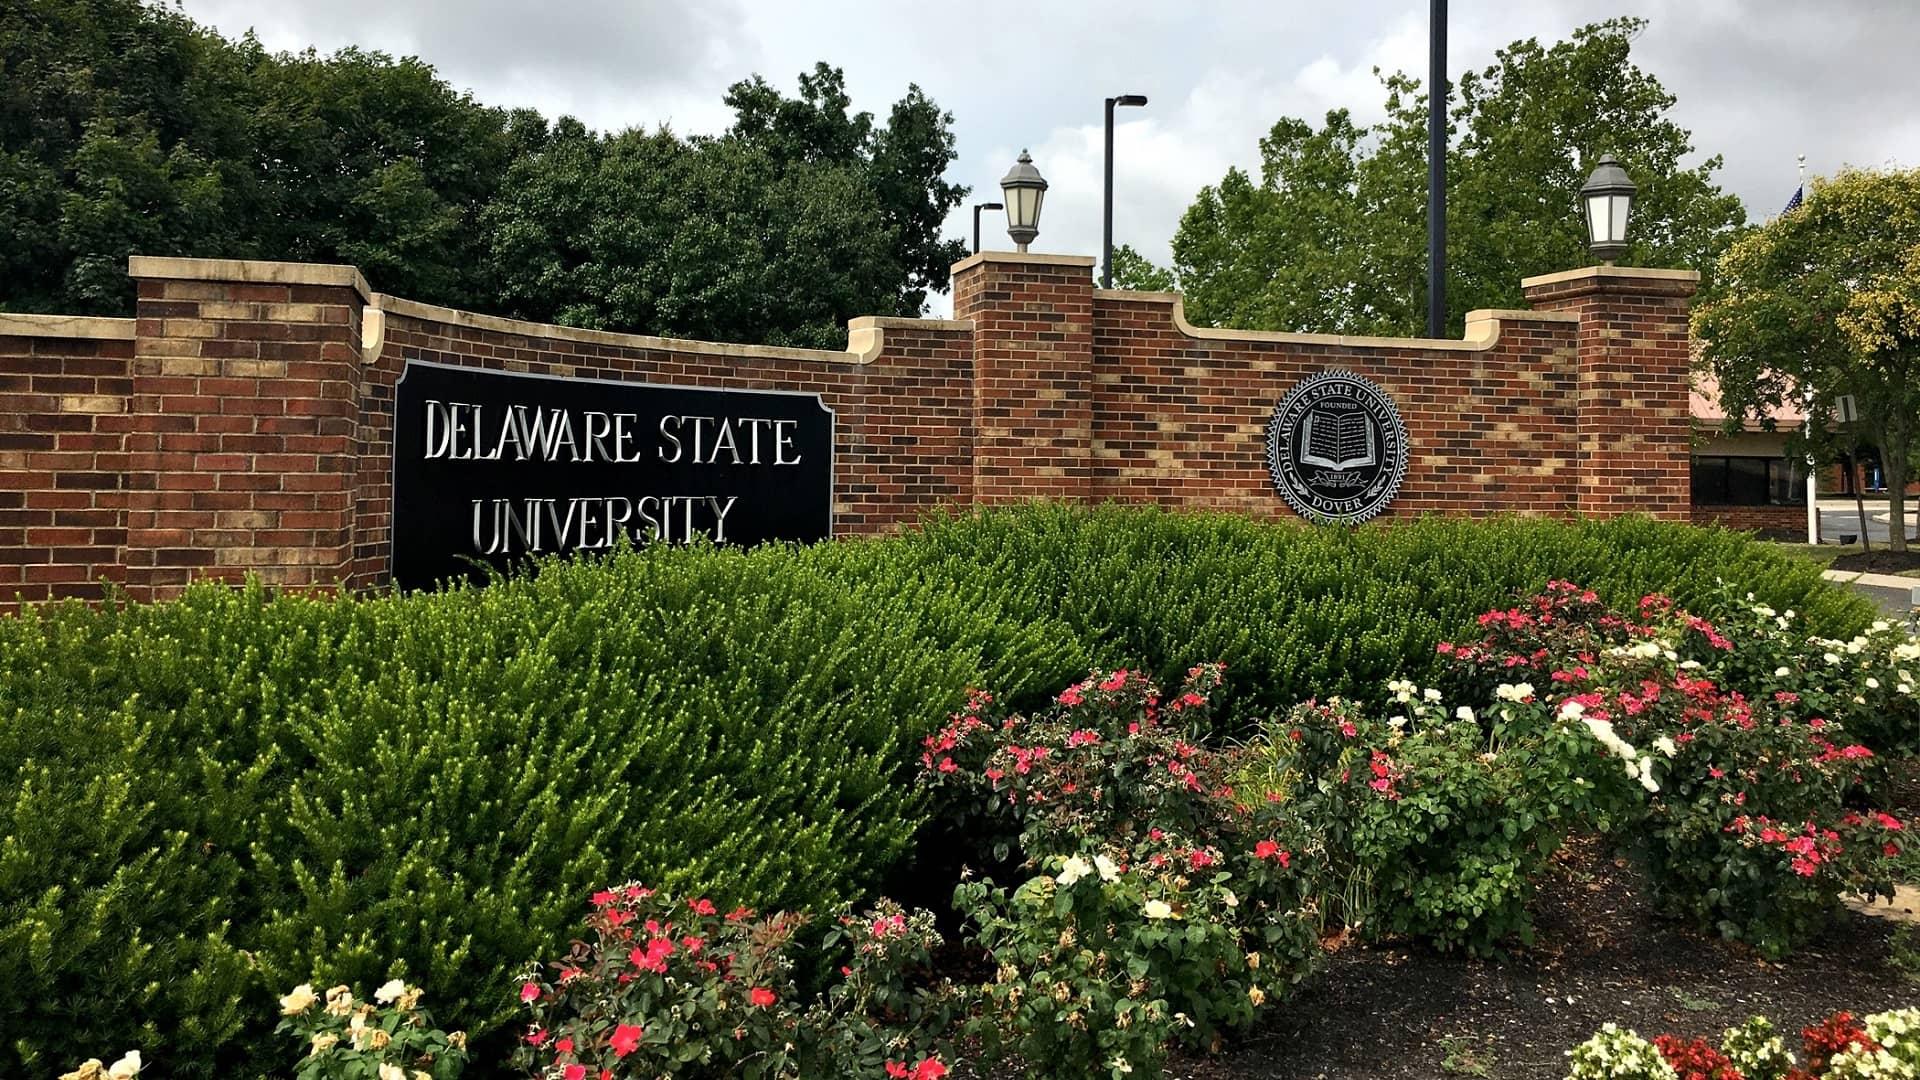 Delaware State University to cancel 730K in student debt